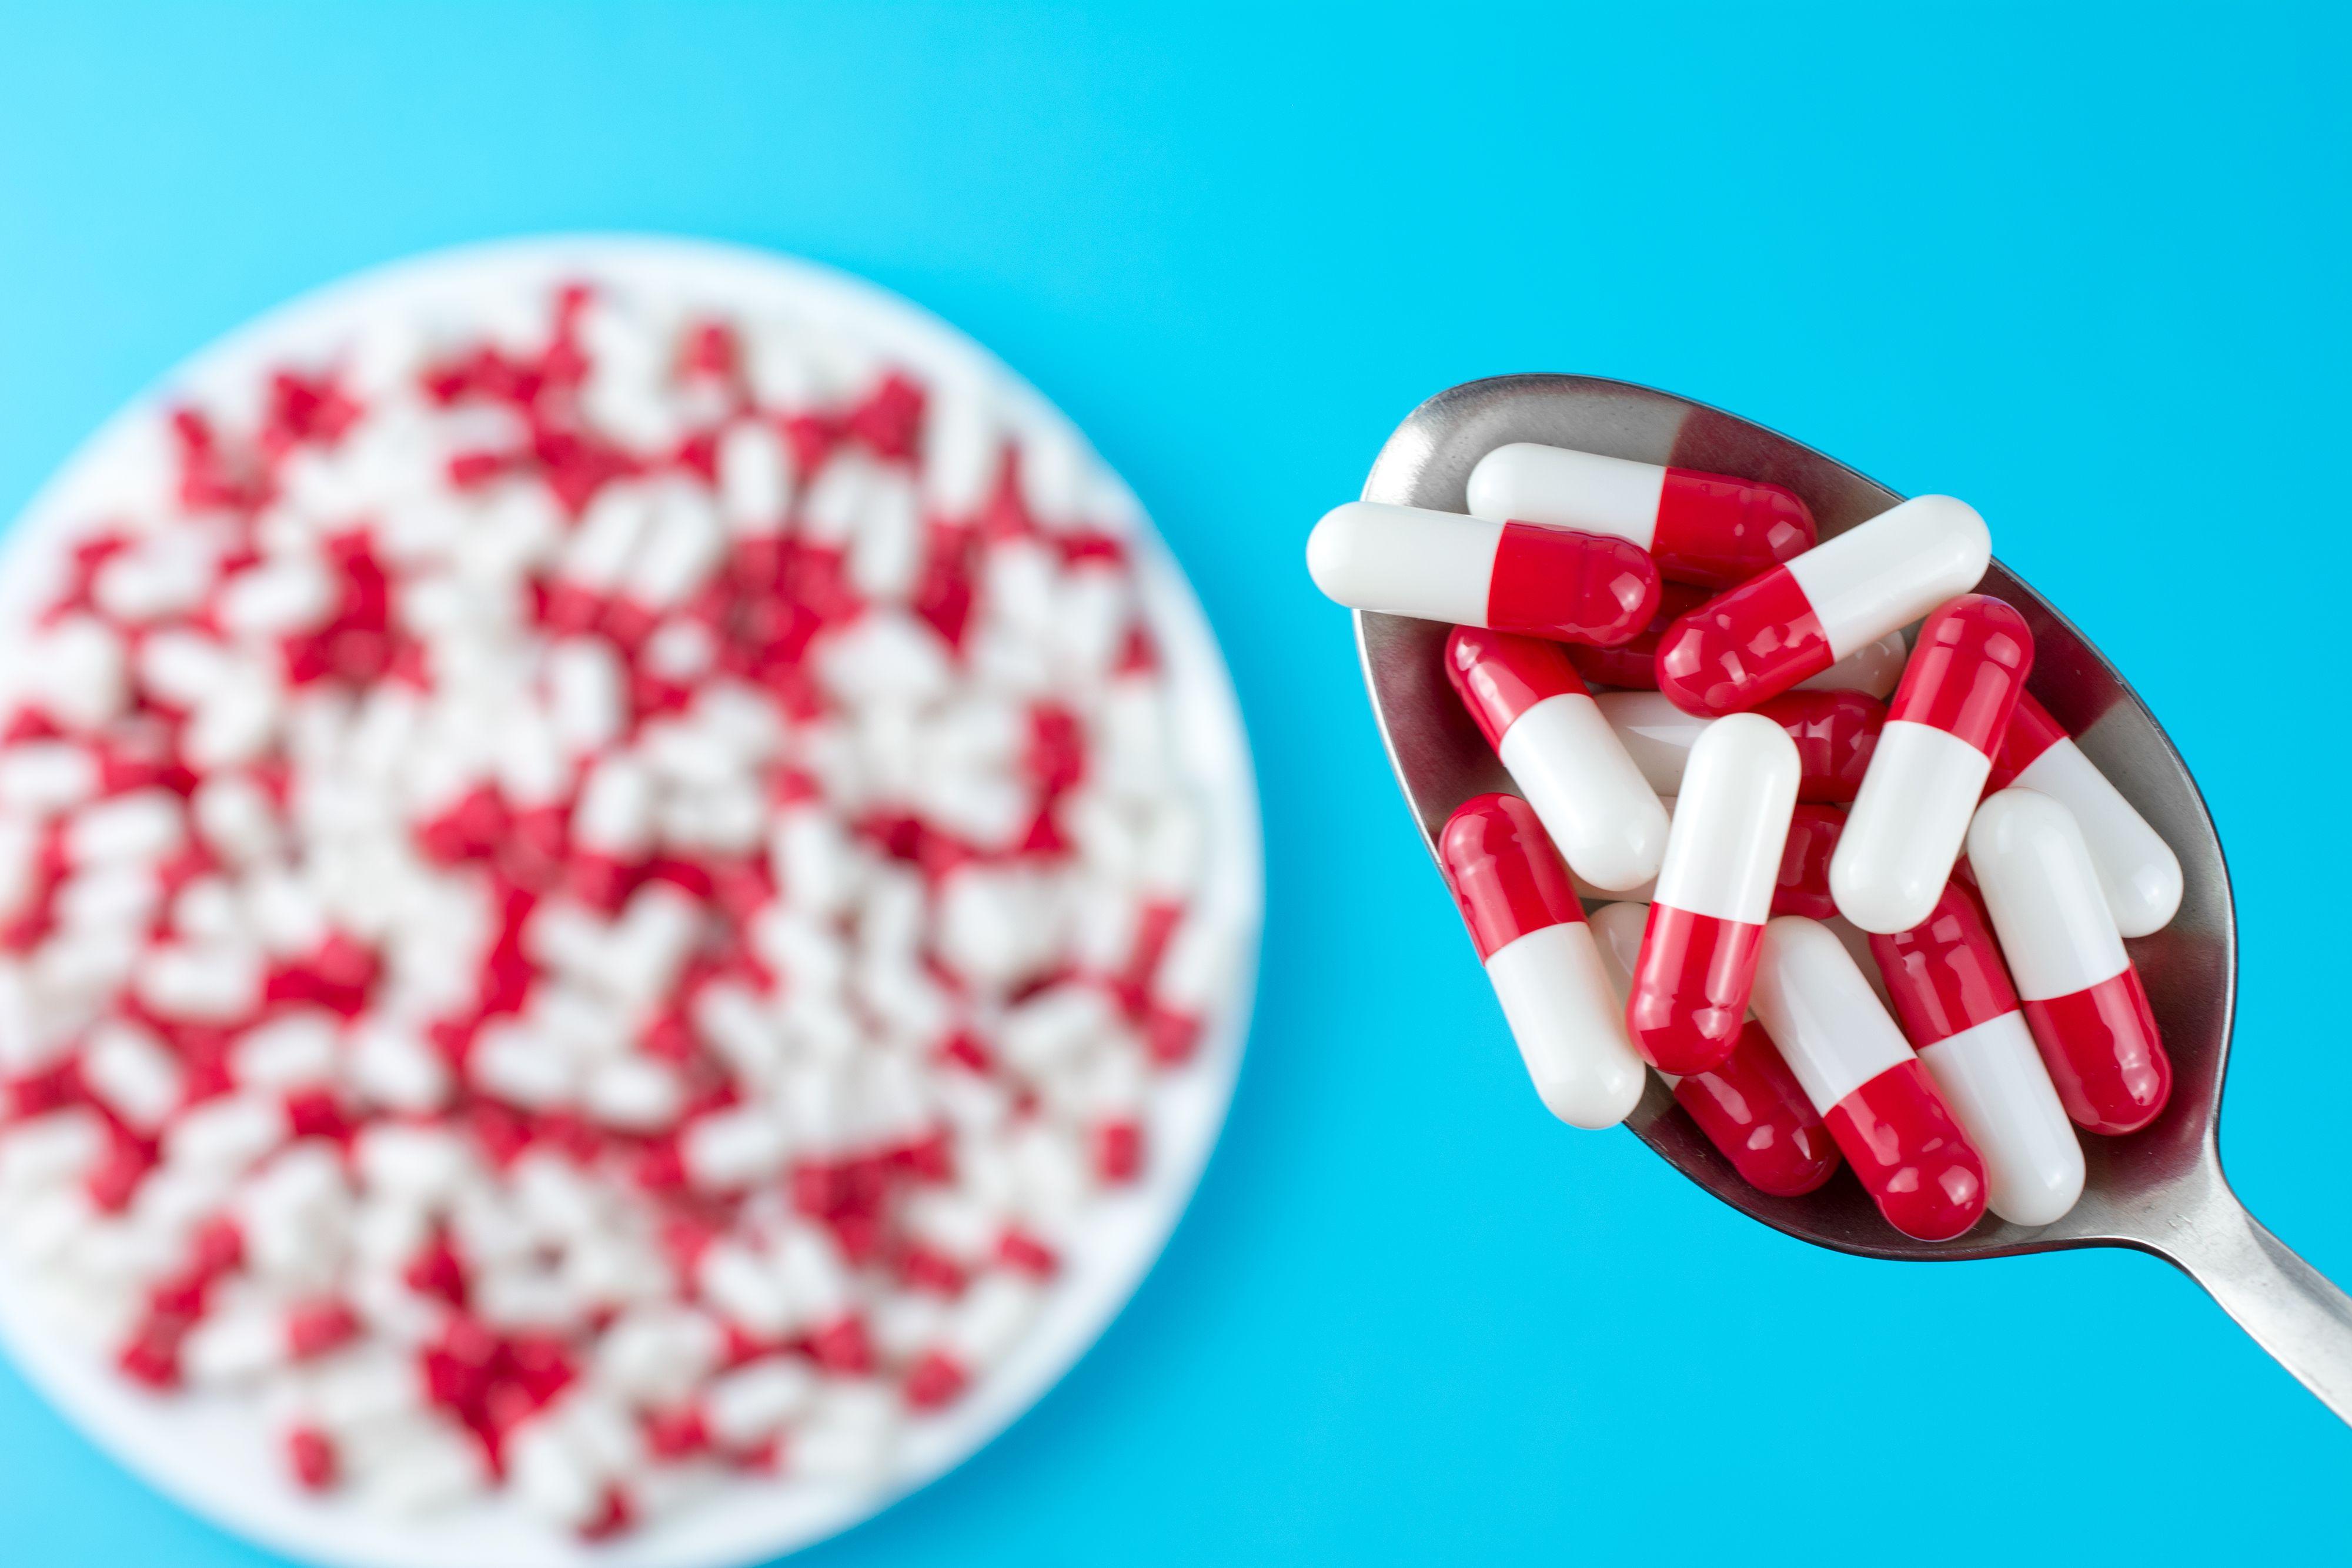 keto advanced pills side effects